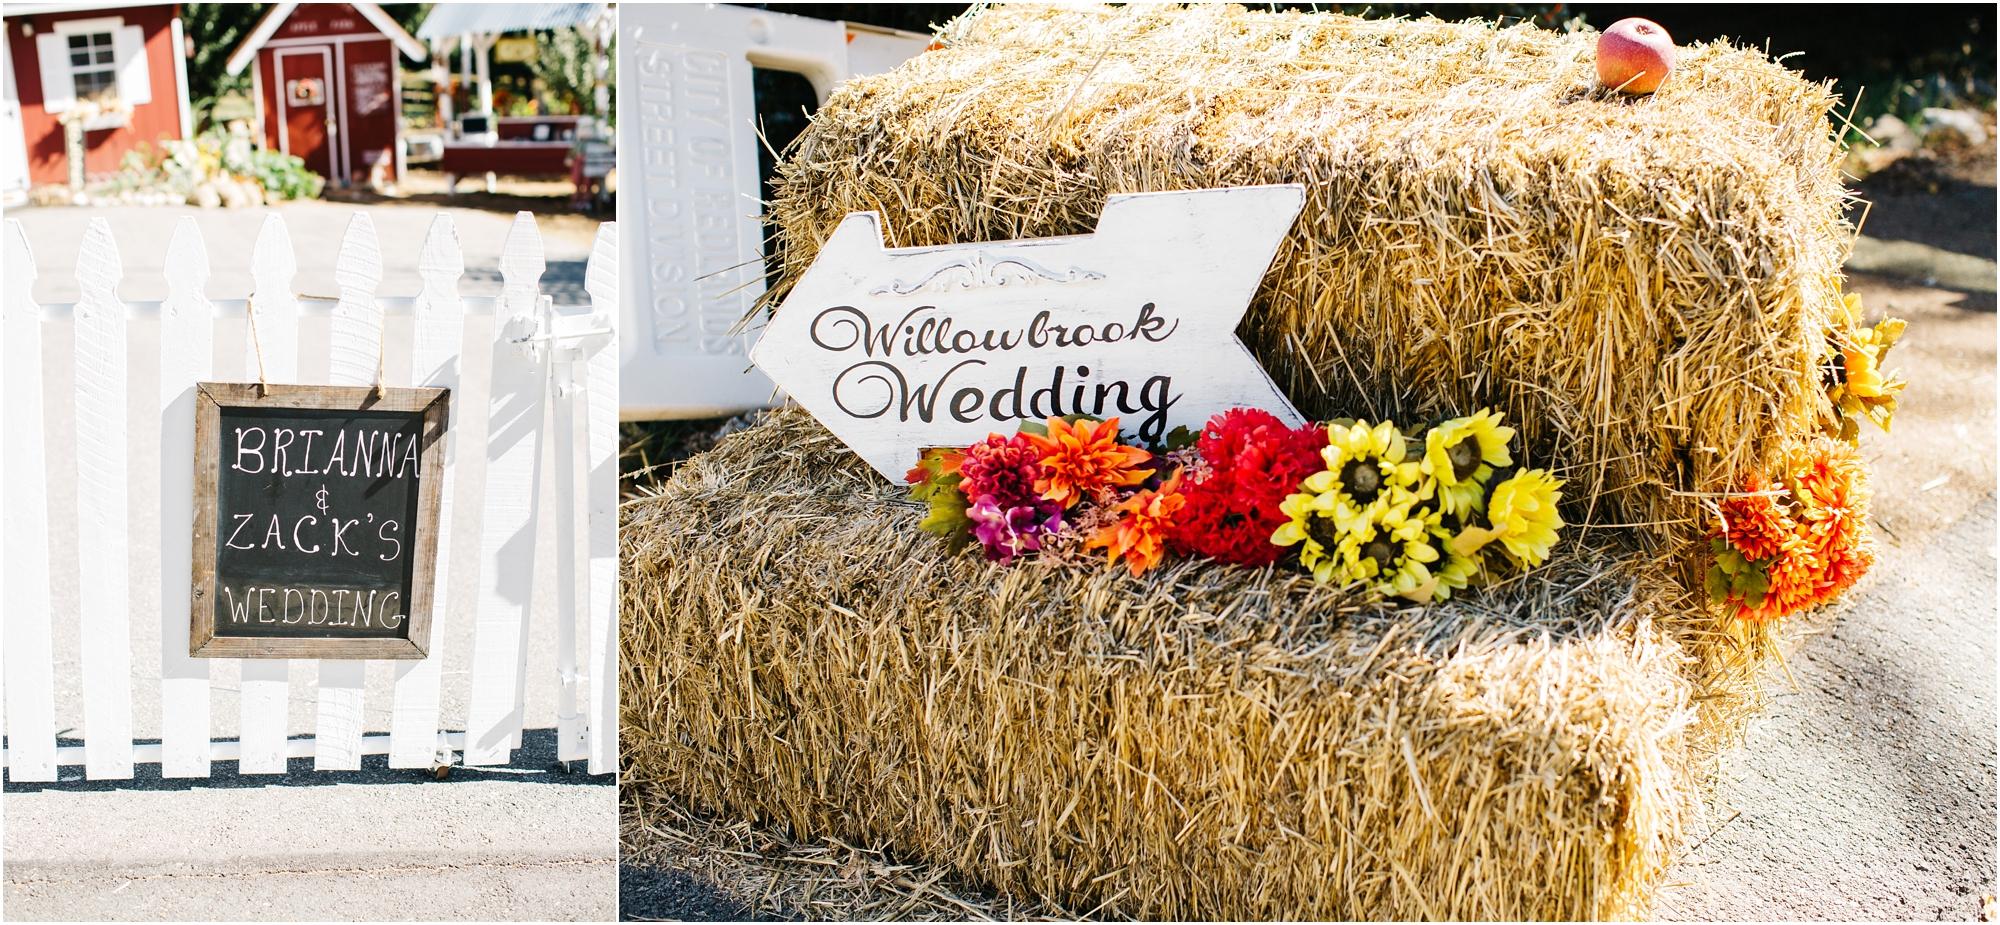 Apple Farm Wedding - https://brittneyhannonphotography.com